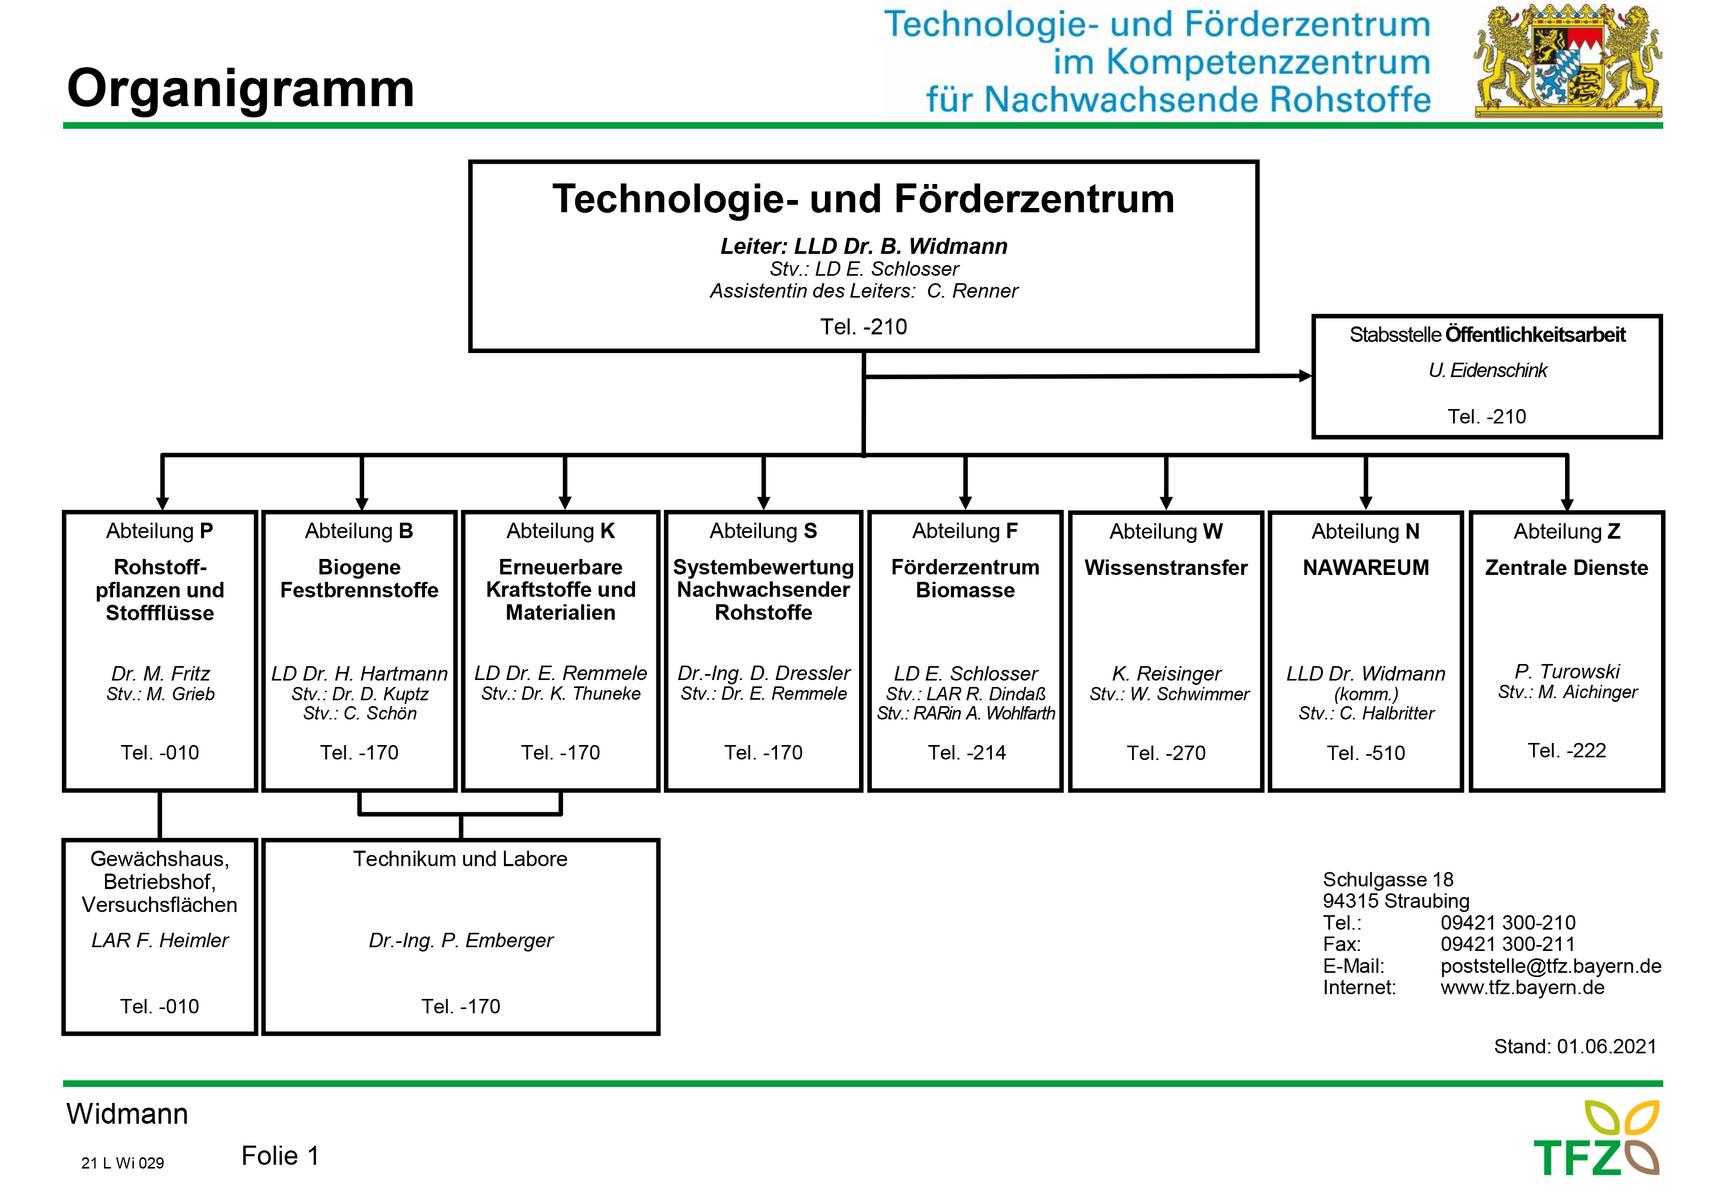 tfz-organigramm